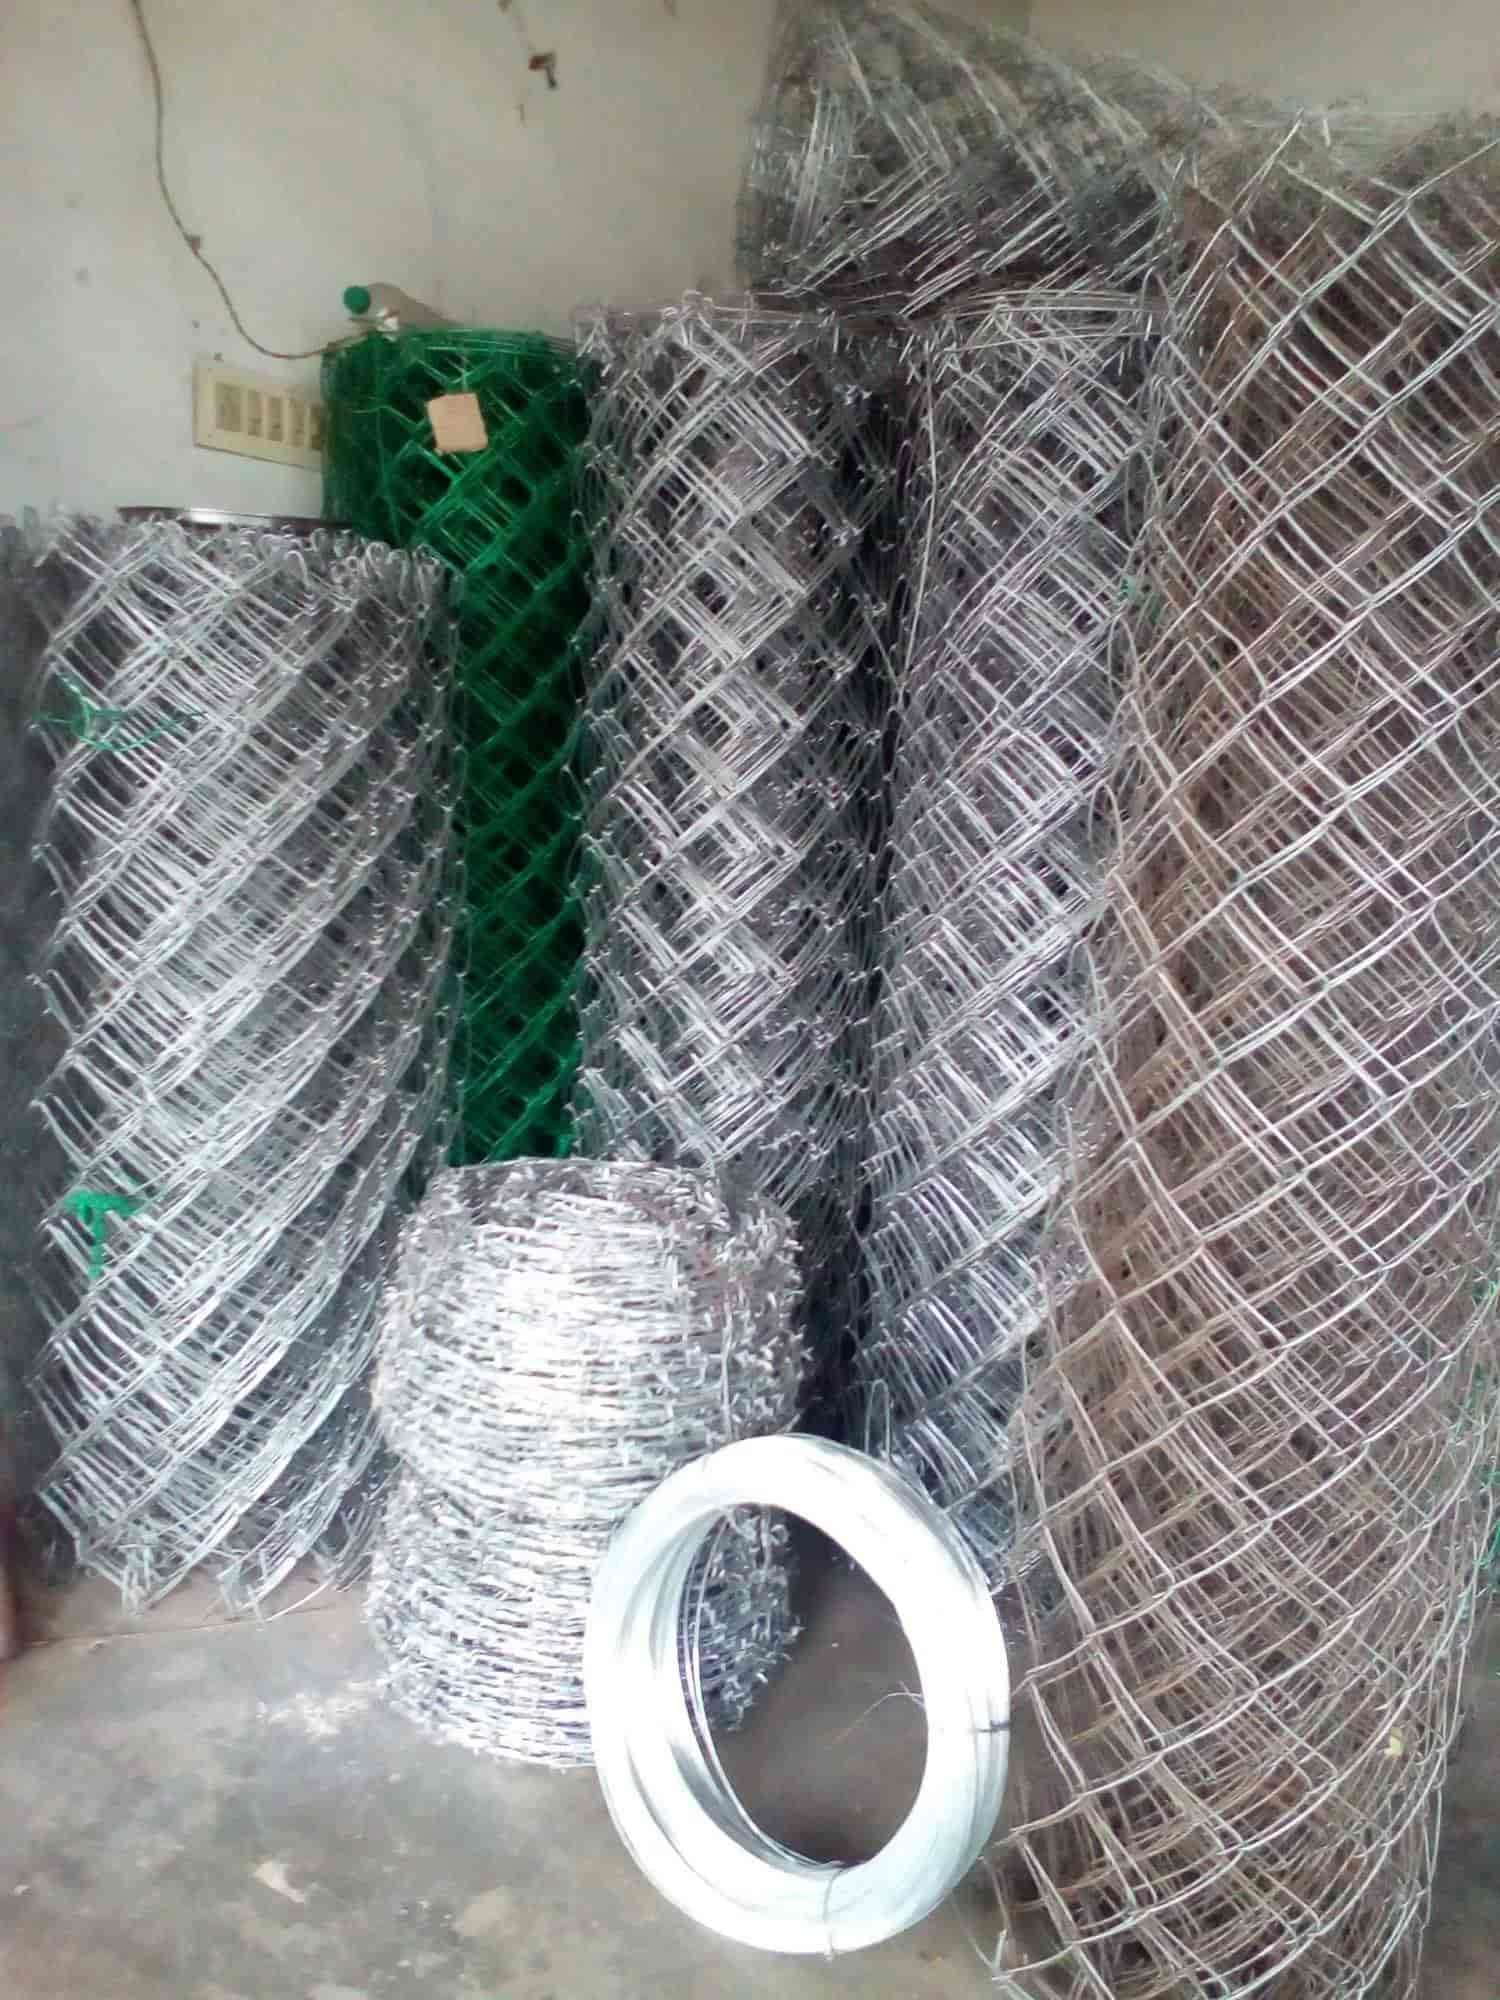 Sri Vaari Wire Netting Photos Vyasarpadi Khammam Pictures Mesh Wiring Chennai Fencing Gi Manufacturers